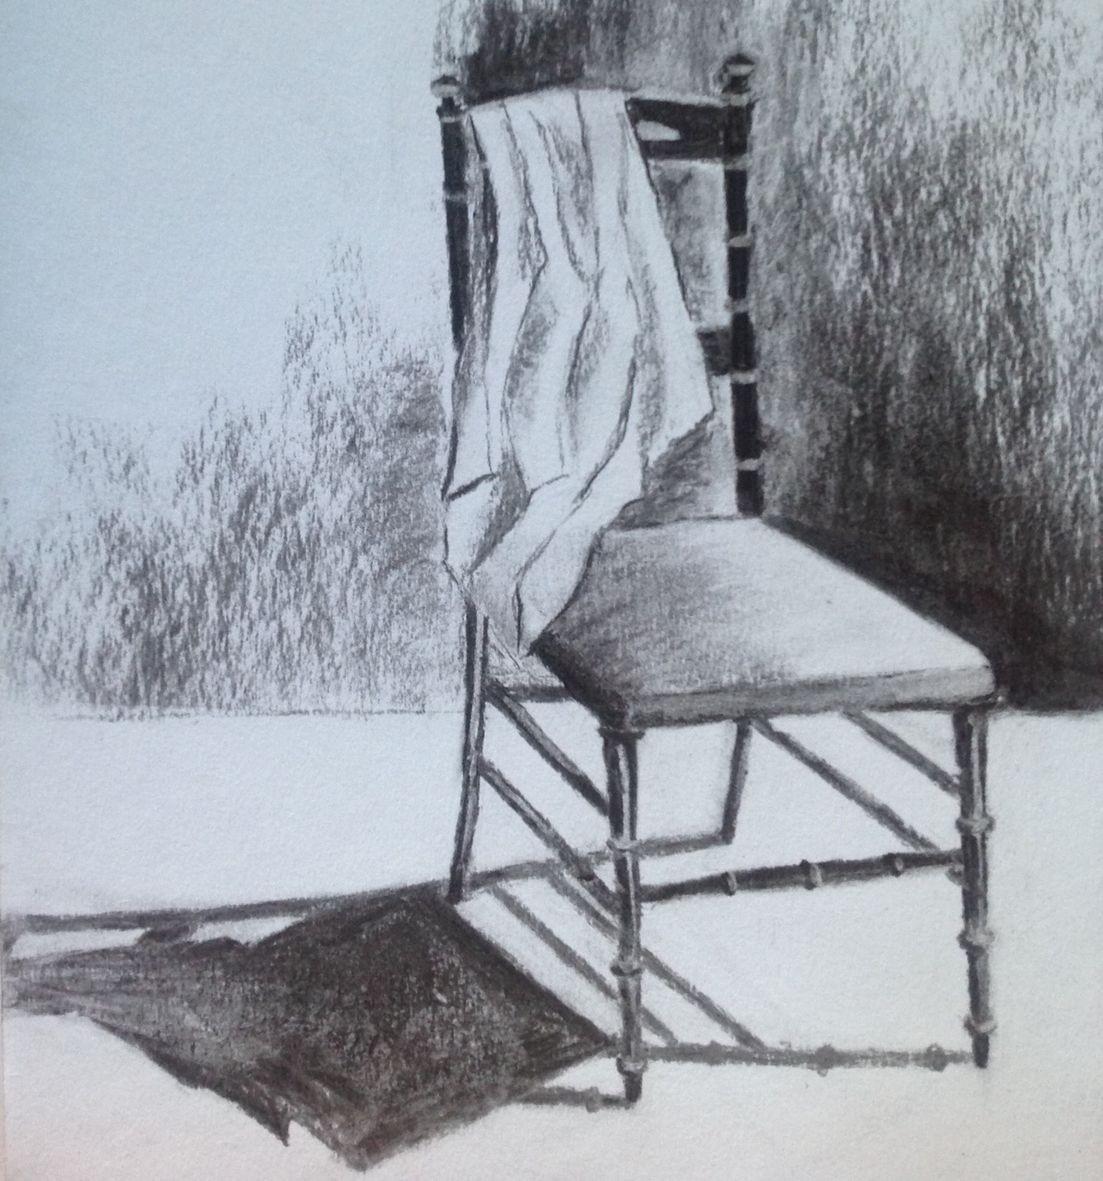 Rose marie chaise et drape fusain 04 2020